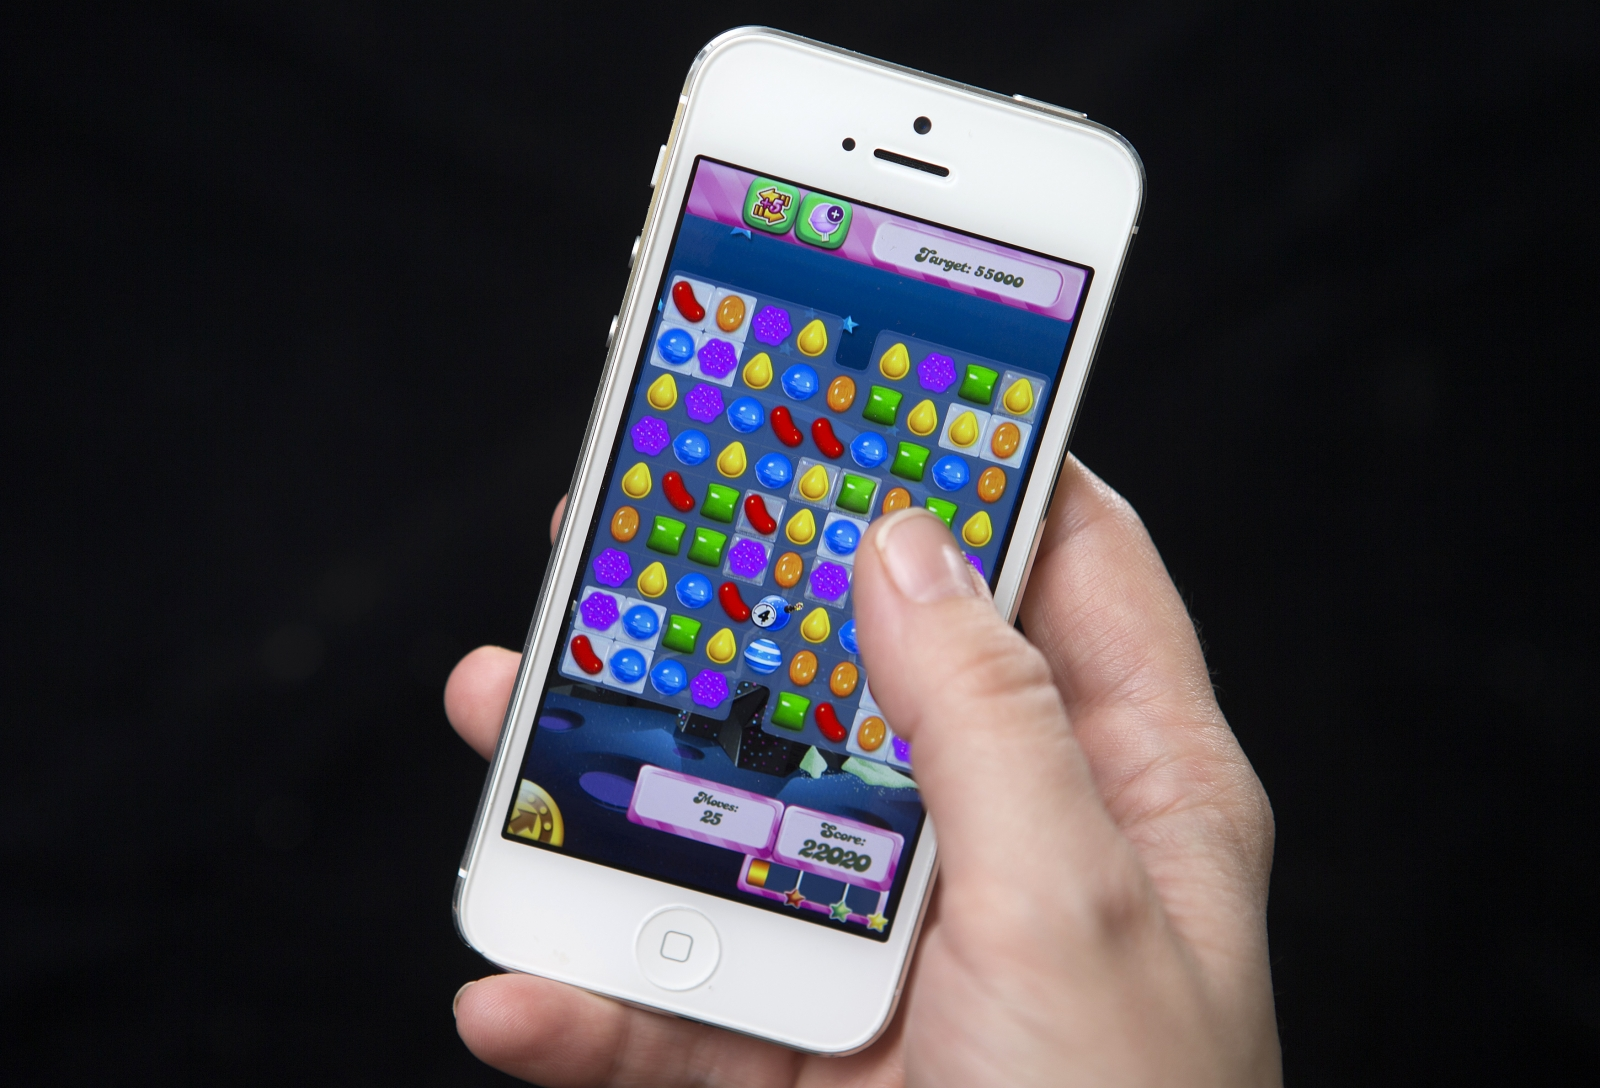 Candy Crush Saga mobile app